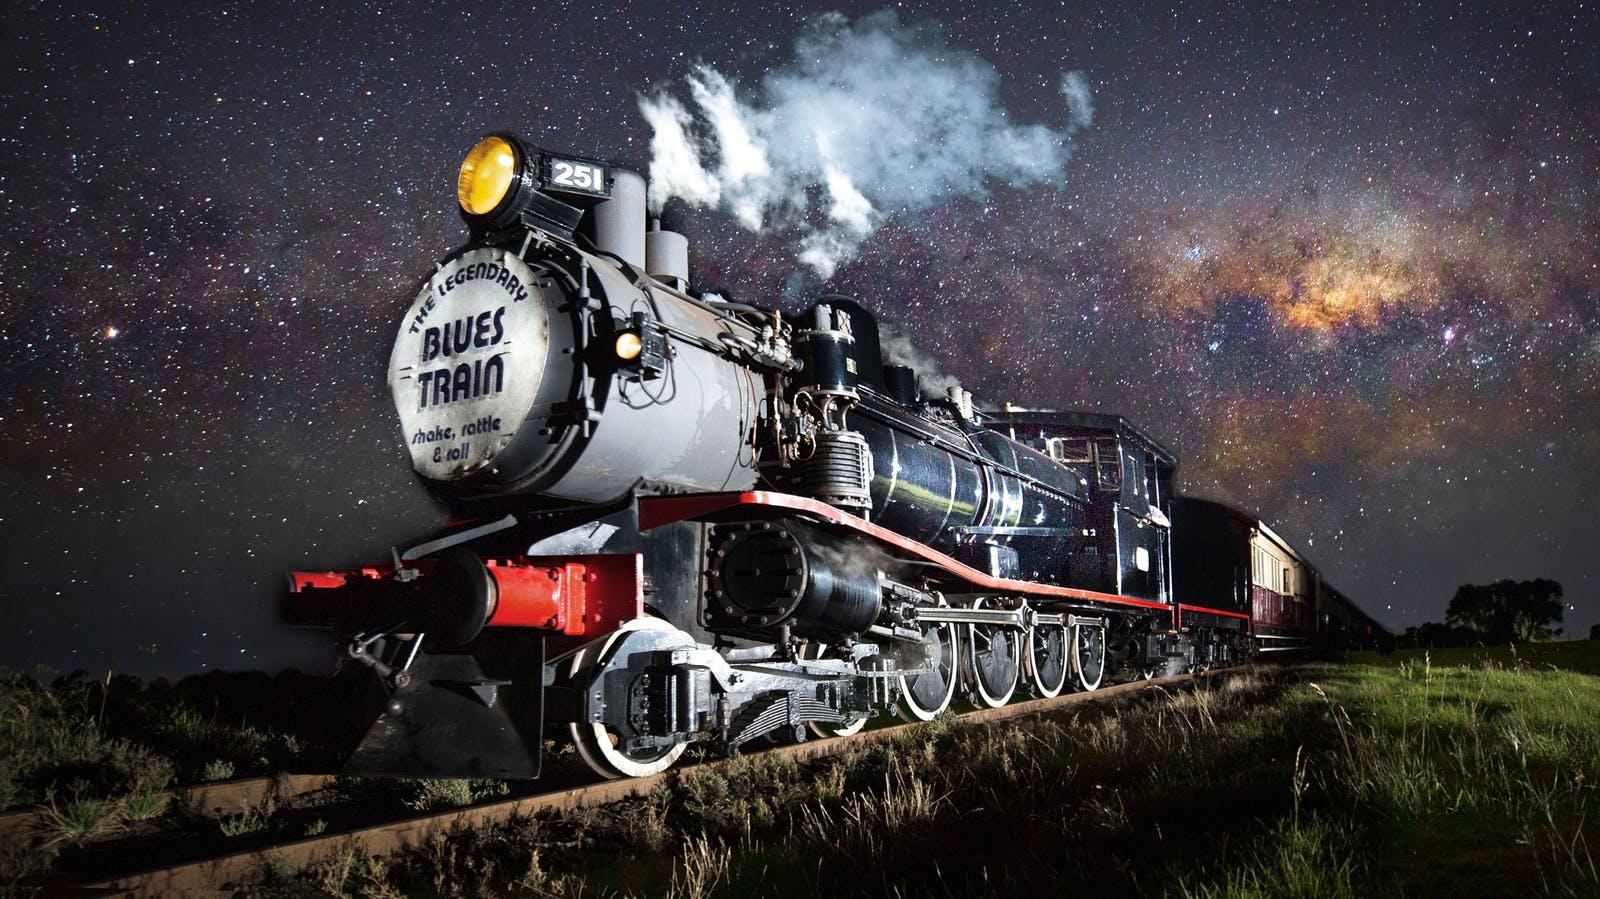 The Blues Train and TClass 251 engine